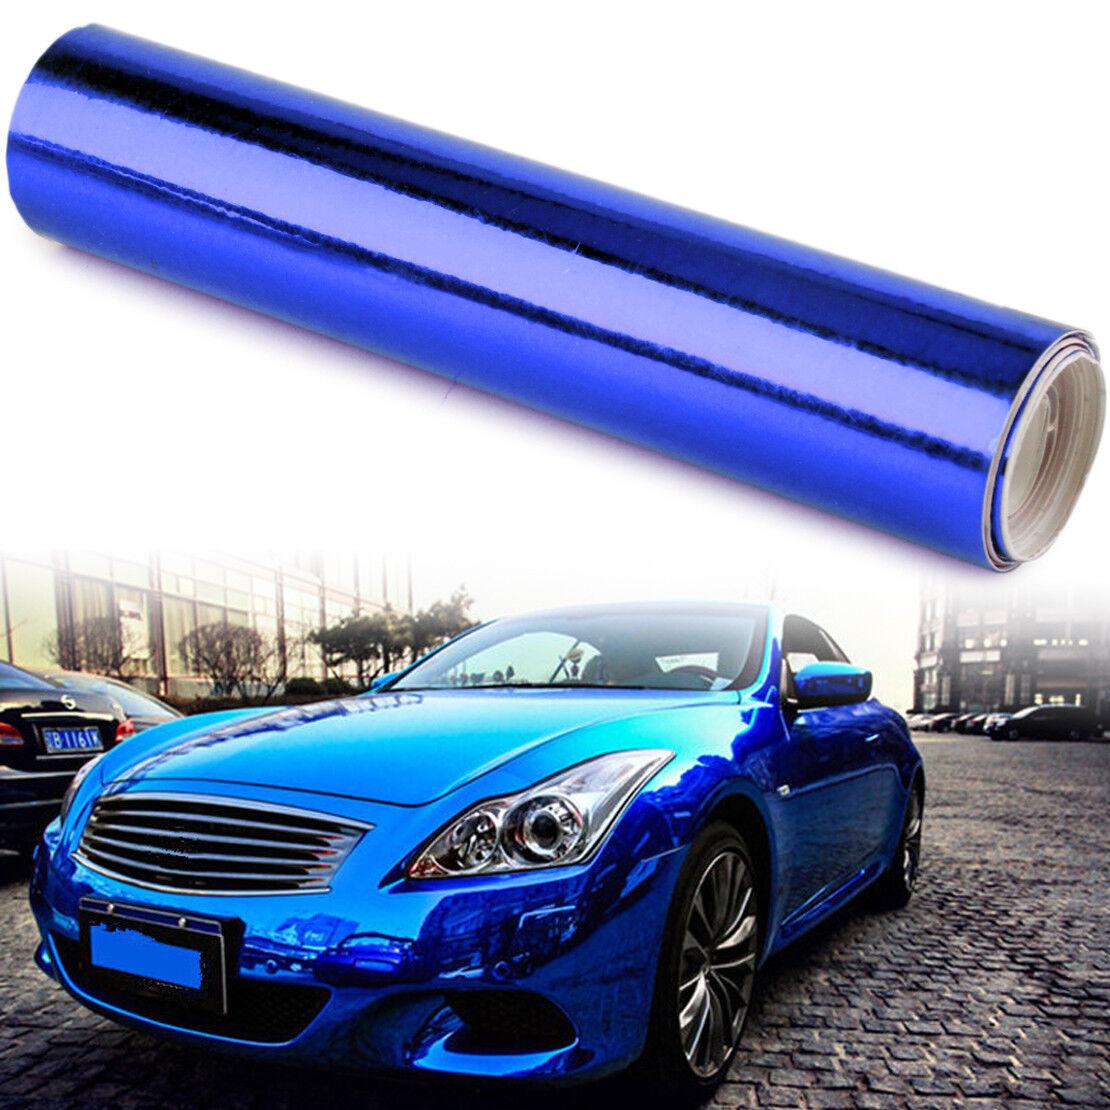 Details about 152cmx30cm Dark Blue Car Glossy Chrome Mirror Vinyl Wrap Film  Roll Sheet Sticker